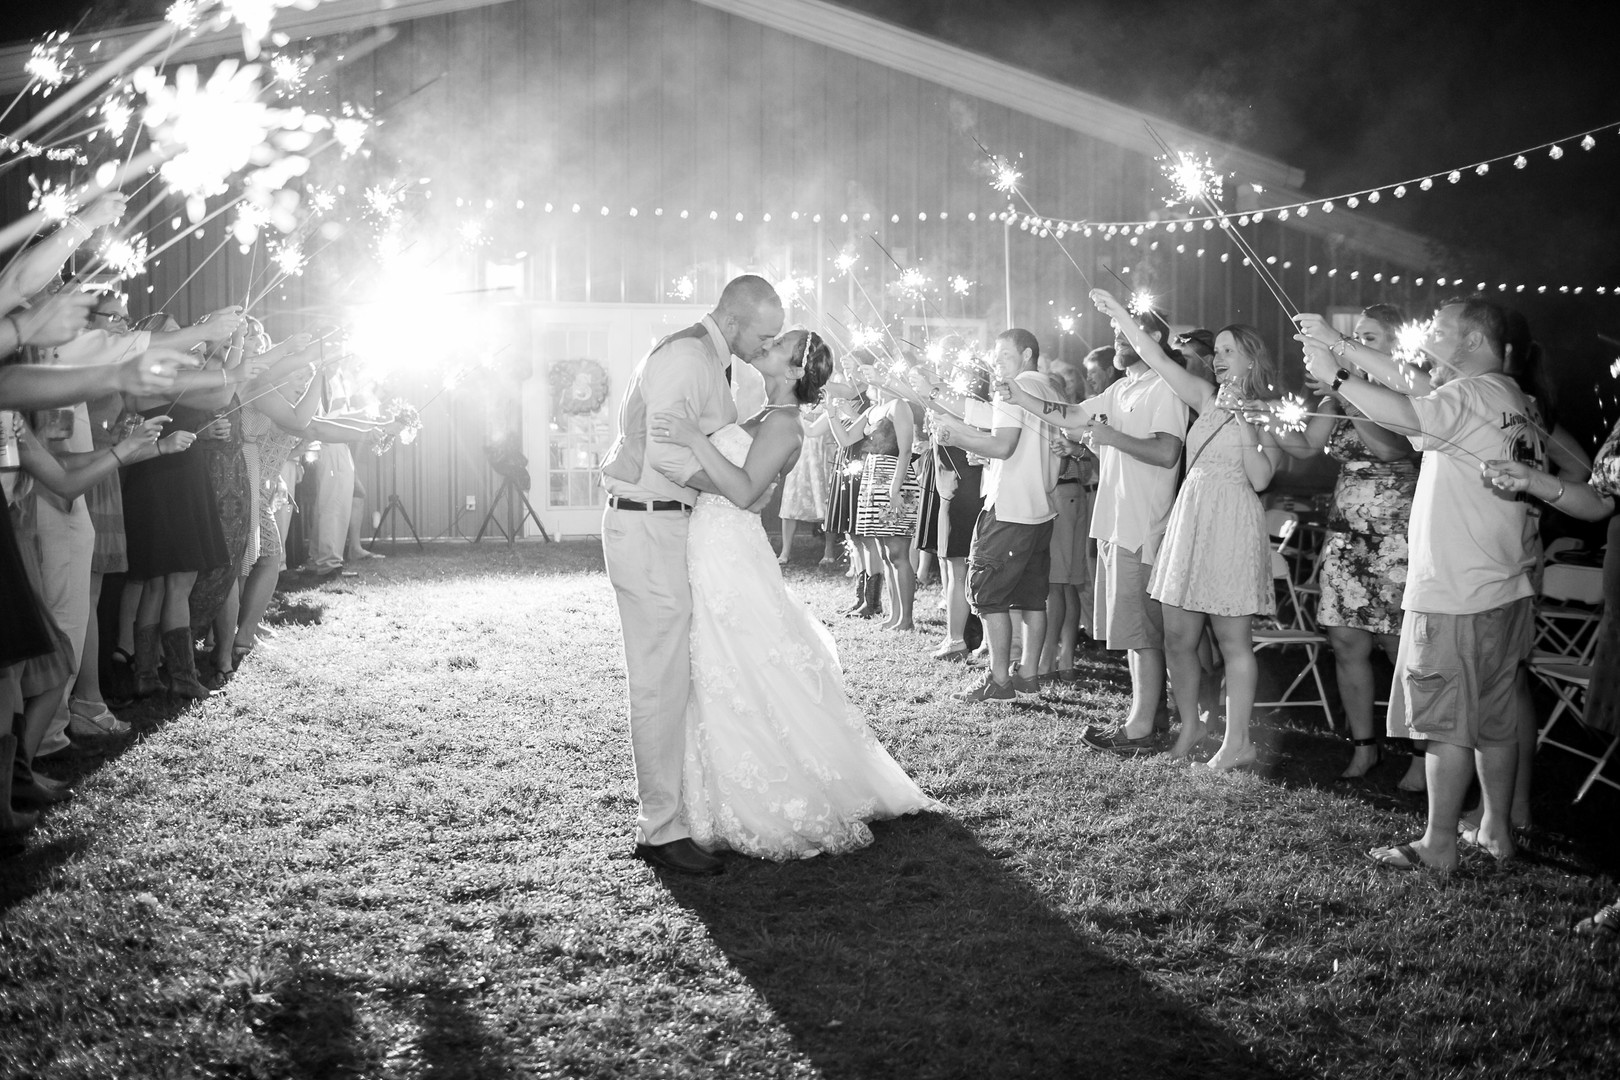 brandy-cameron-wedding-972.jpg